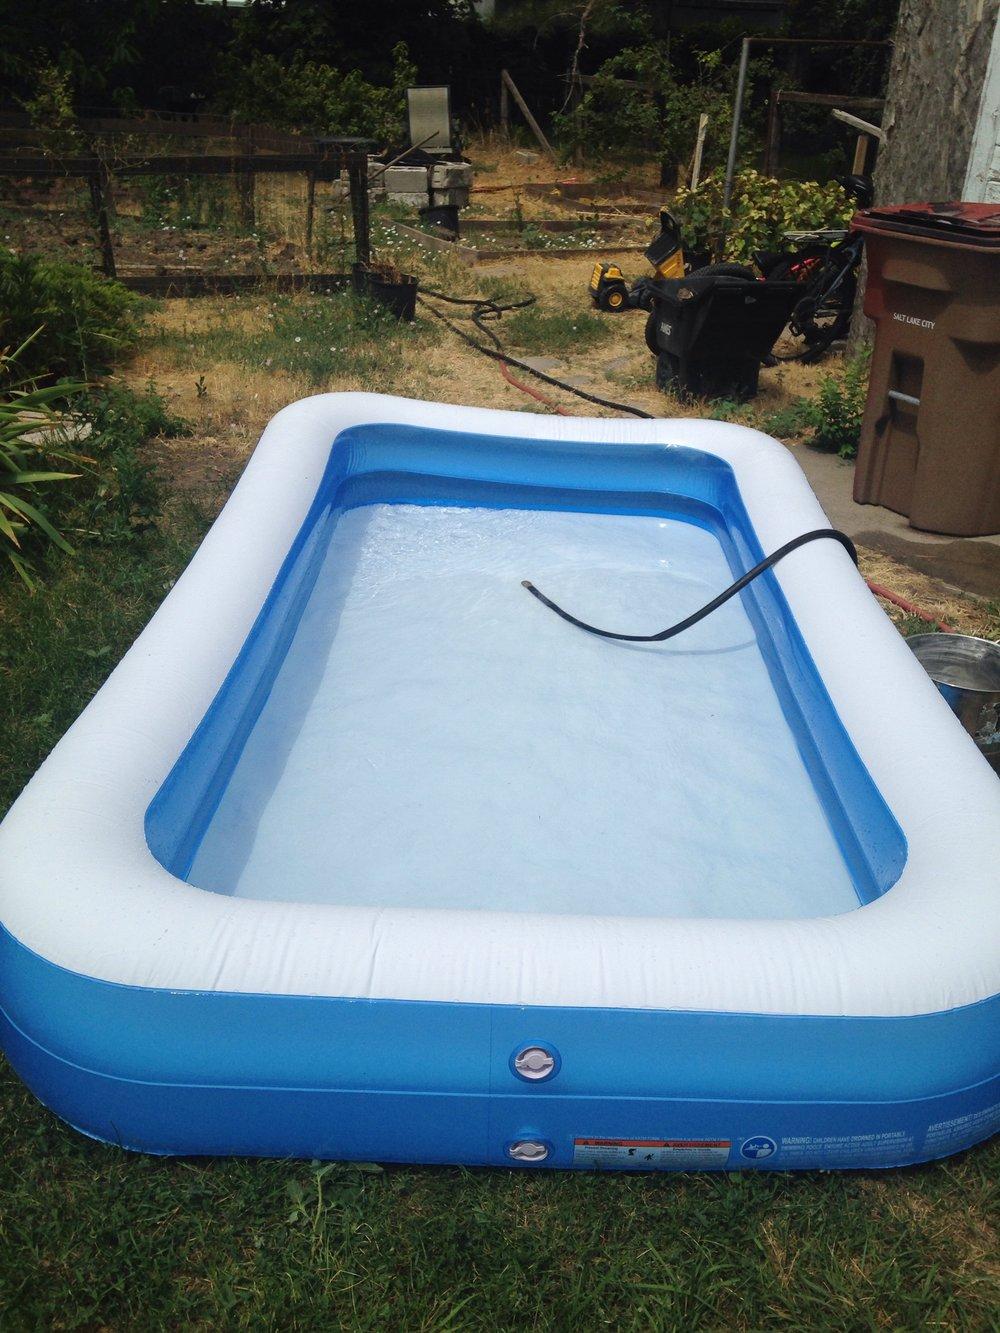 Inflatable pool, $19.95, backyard, Spencer Roddan's home, Salt Lake City, Utah, August 8, 2017.